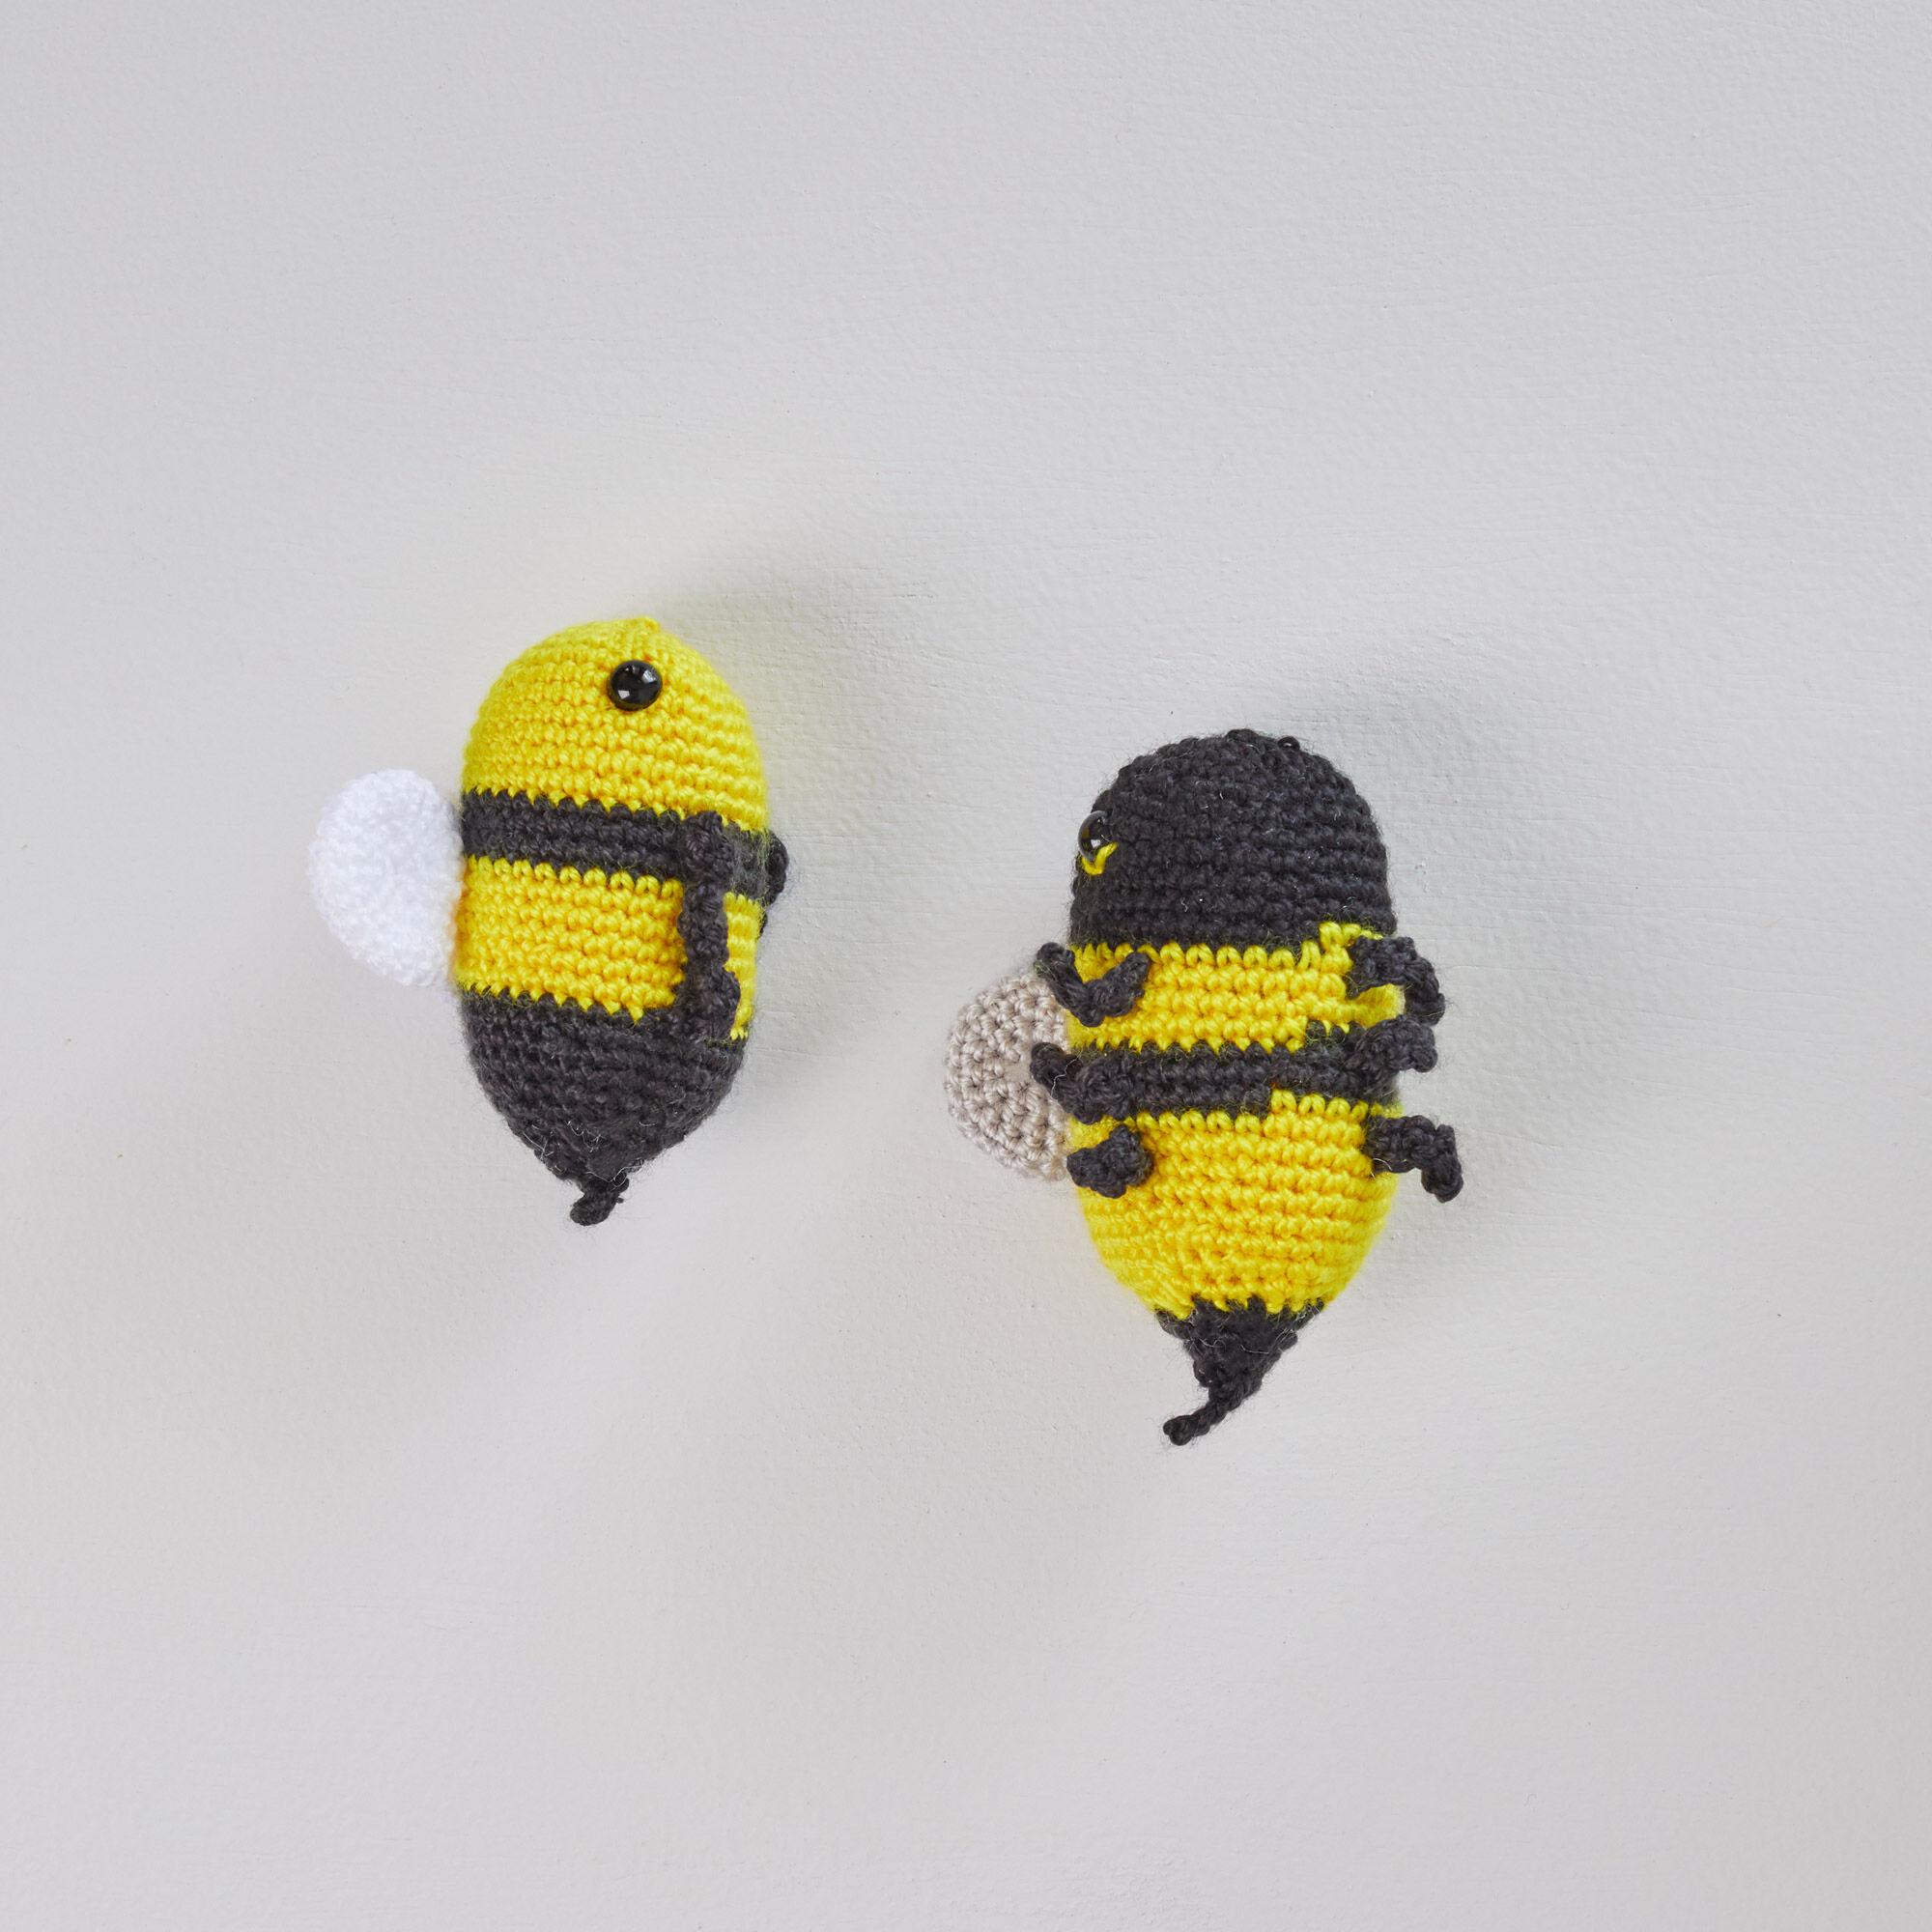 How to Crochet a Bumble Bee Amigurumi - Club Crochet | 2000x2000